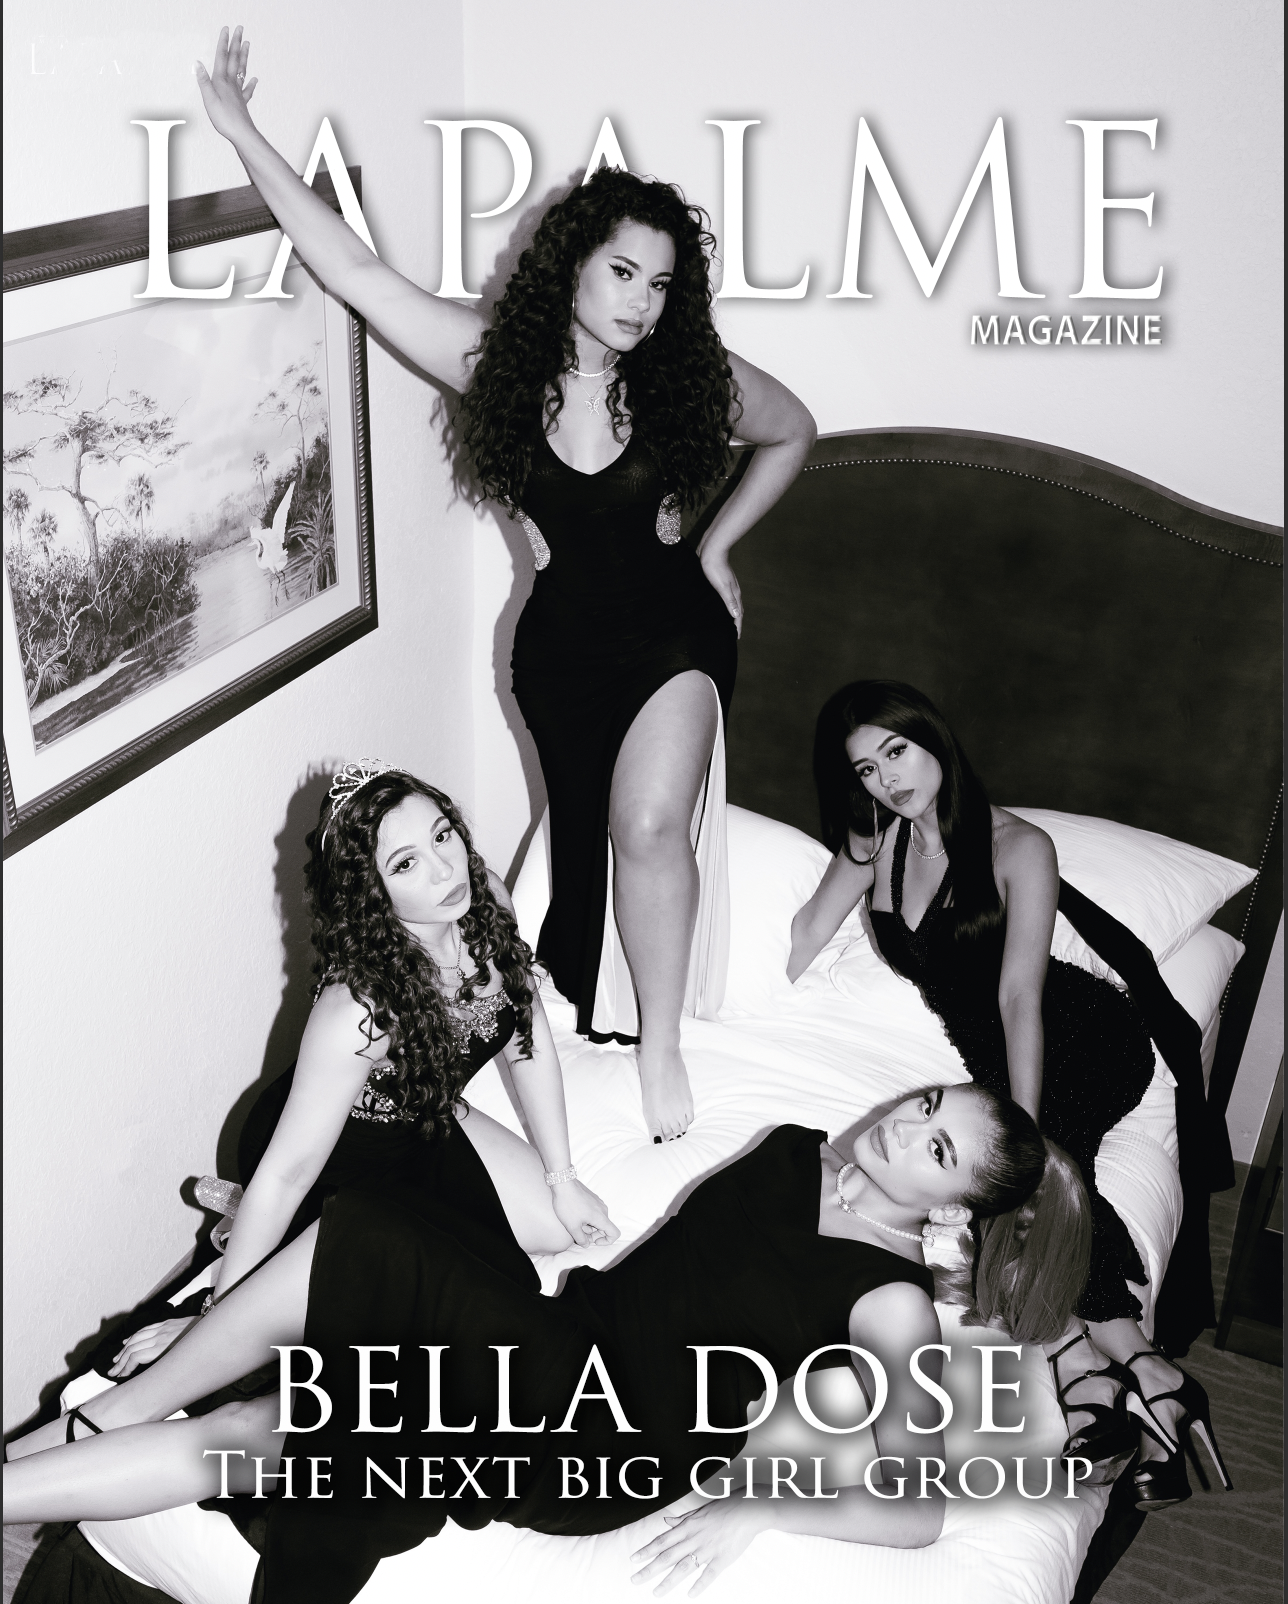 Bella Dose – The next big girl group